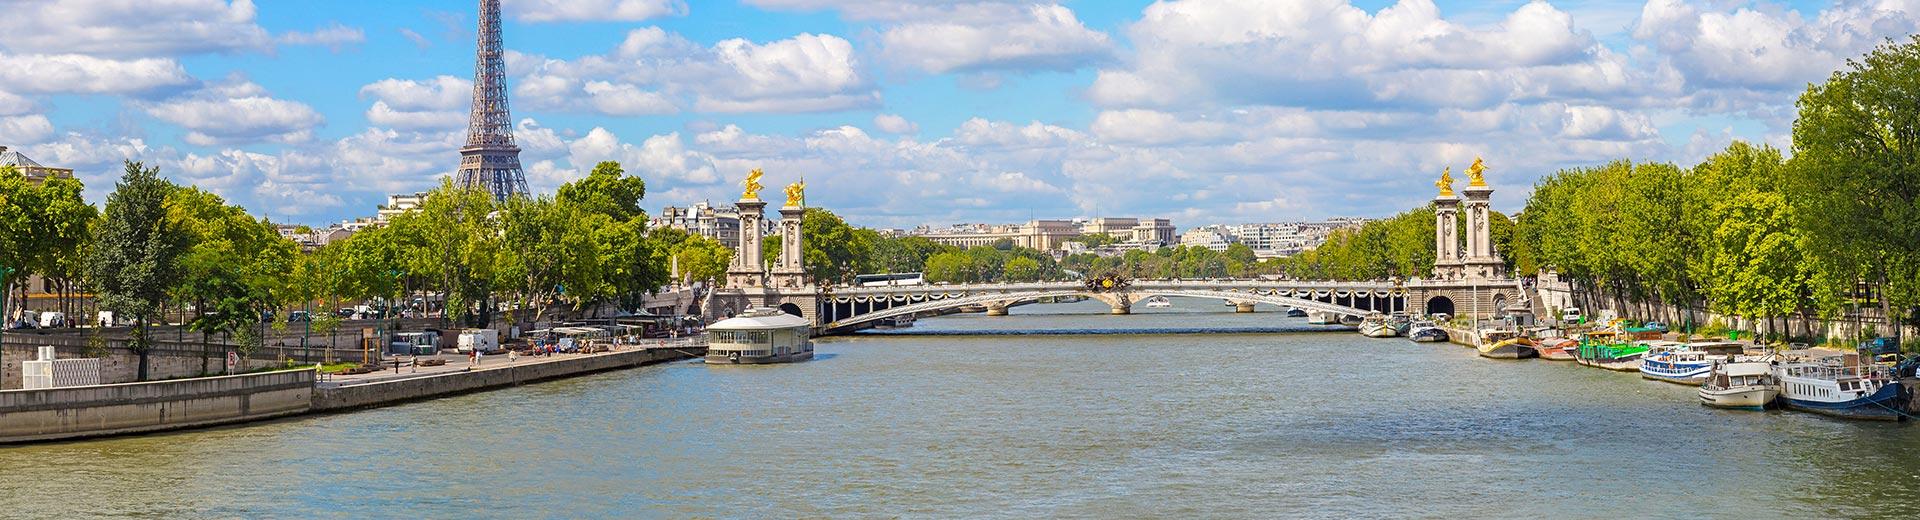 Gruppenreise Paris - Package Gruppen Select Bahn